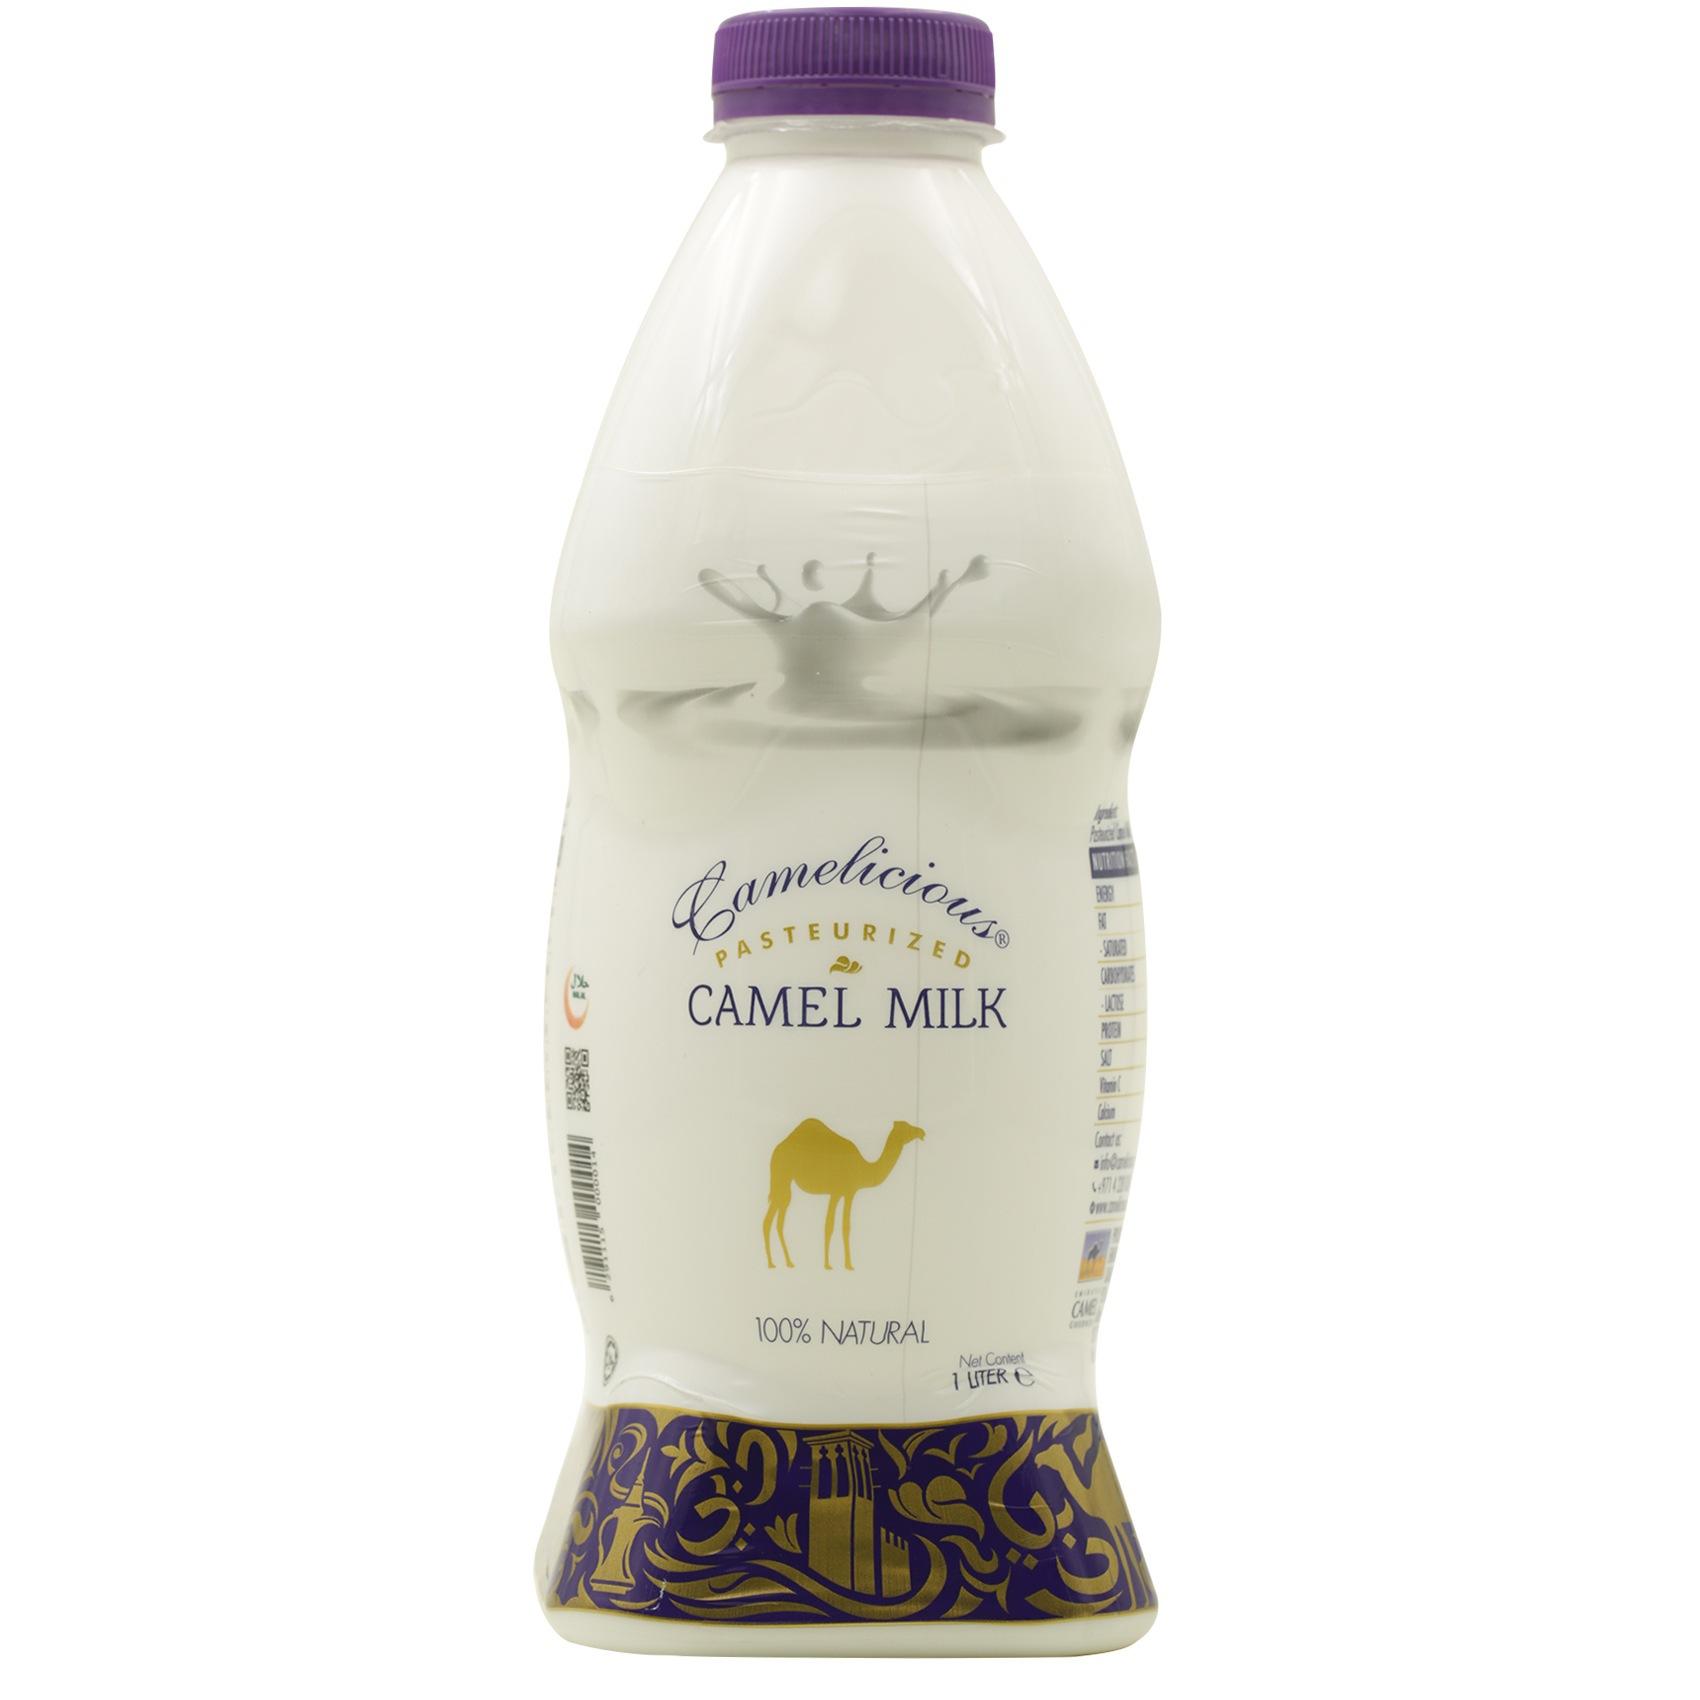 CAMELICIOUS CAMEL MILK 1L